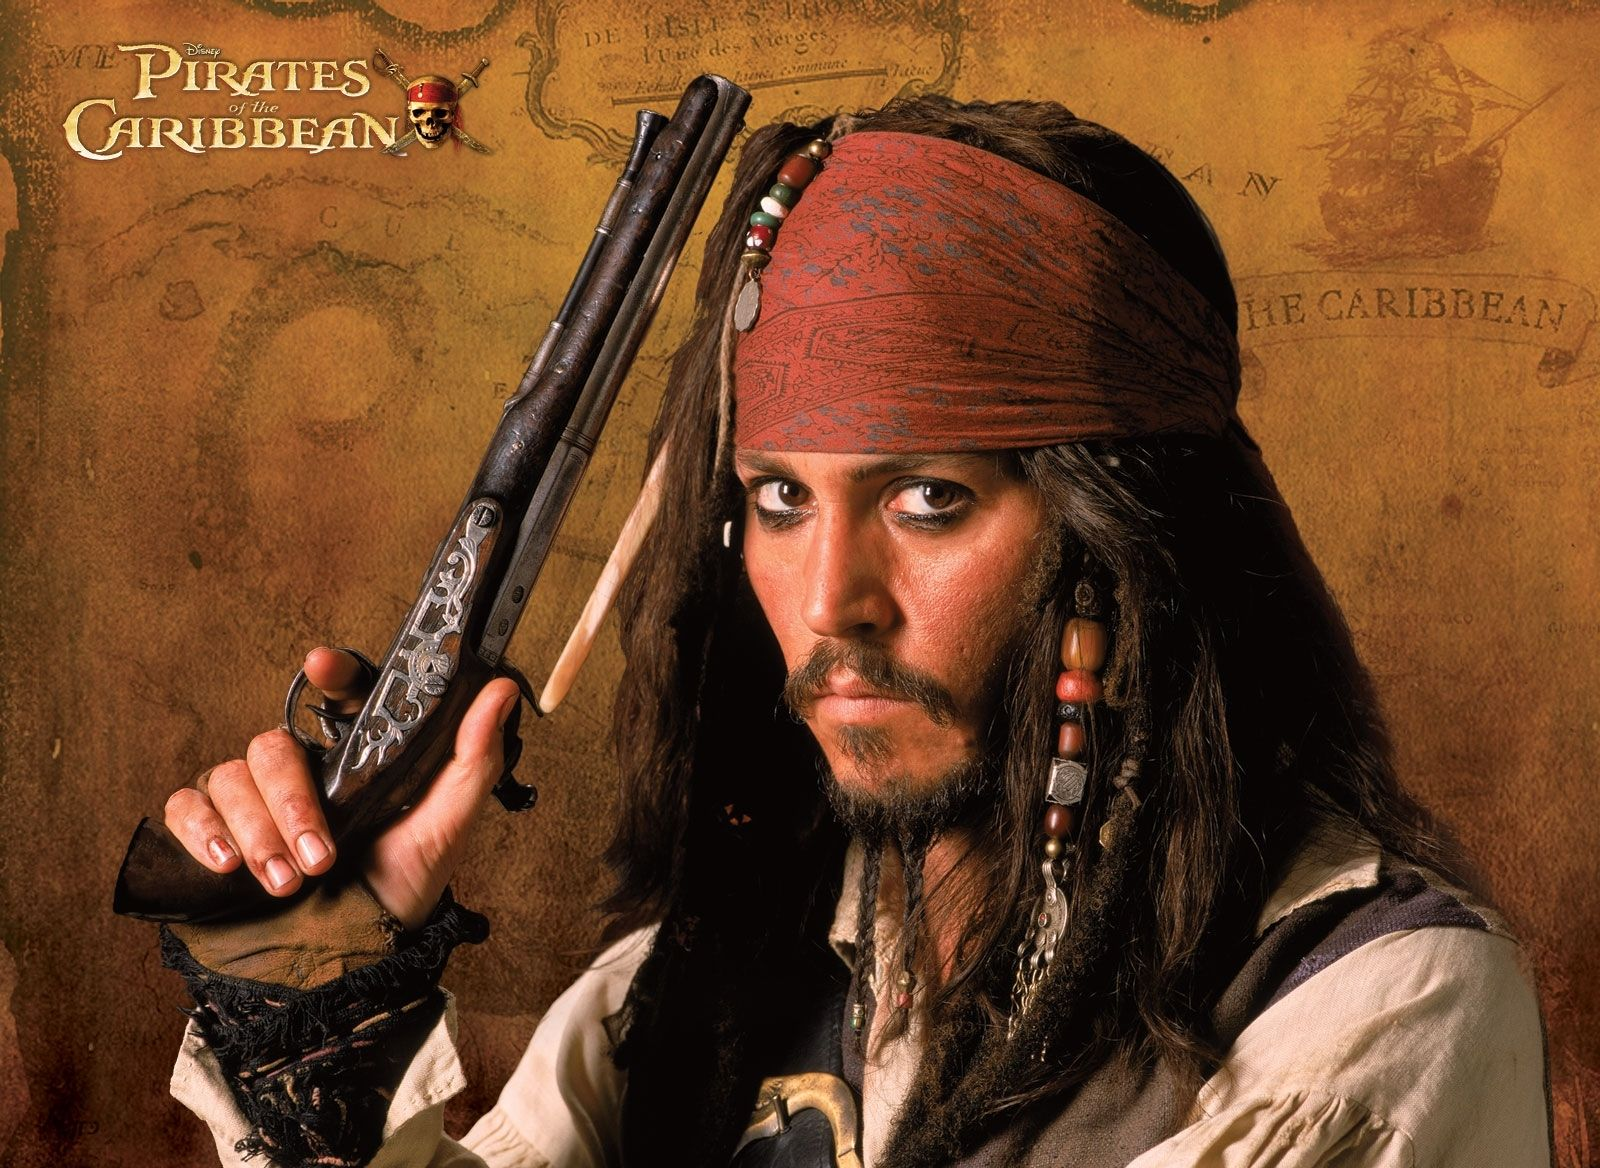 Captain Jack Sparrow Hd Wallpaper Computer - Pirates Of The Caribbean Johnny Depp , HD Wallpaper & Backgrounds